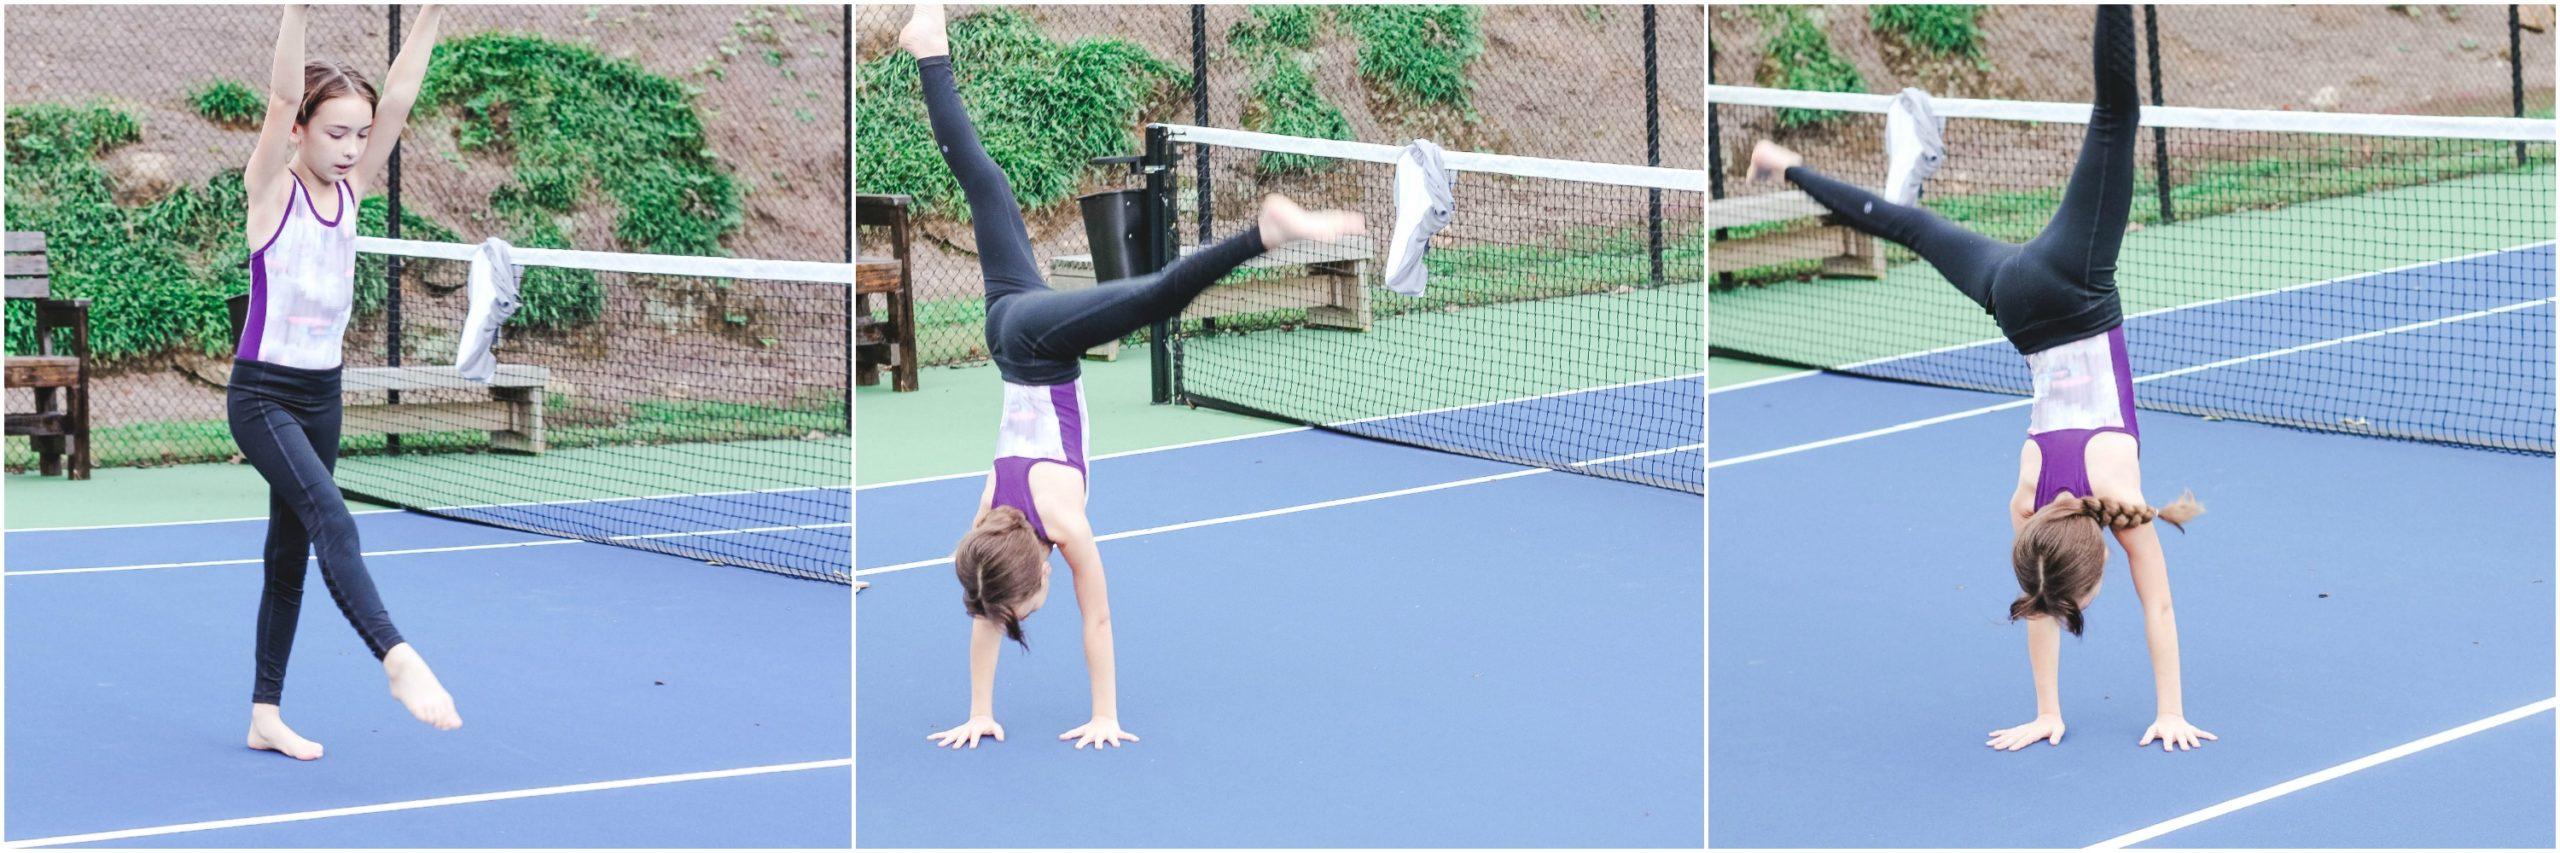 athleta power of she